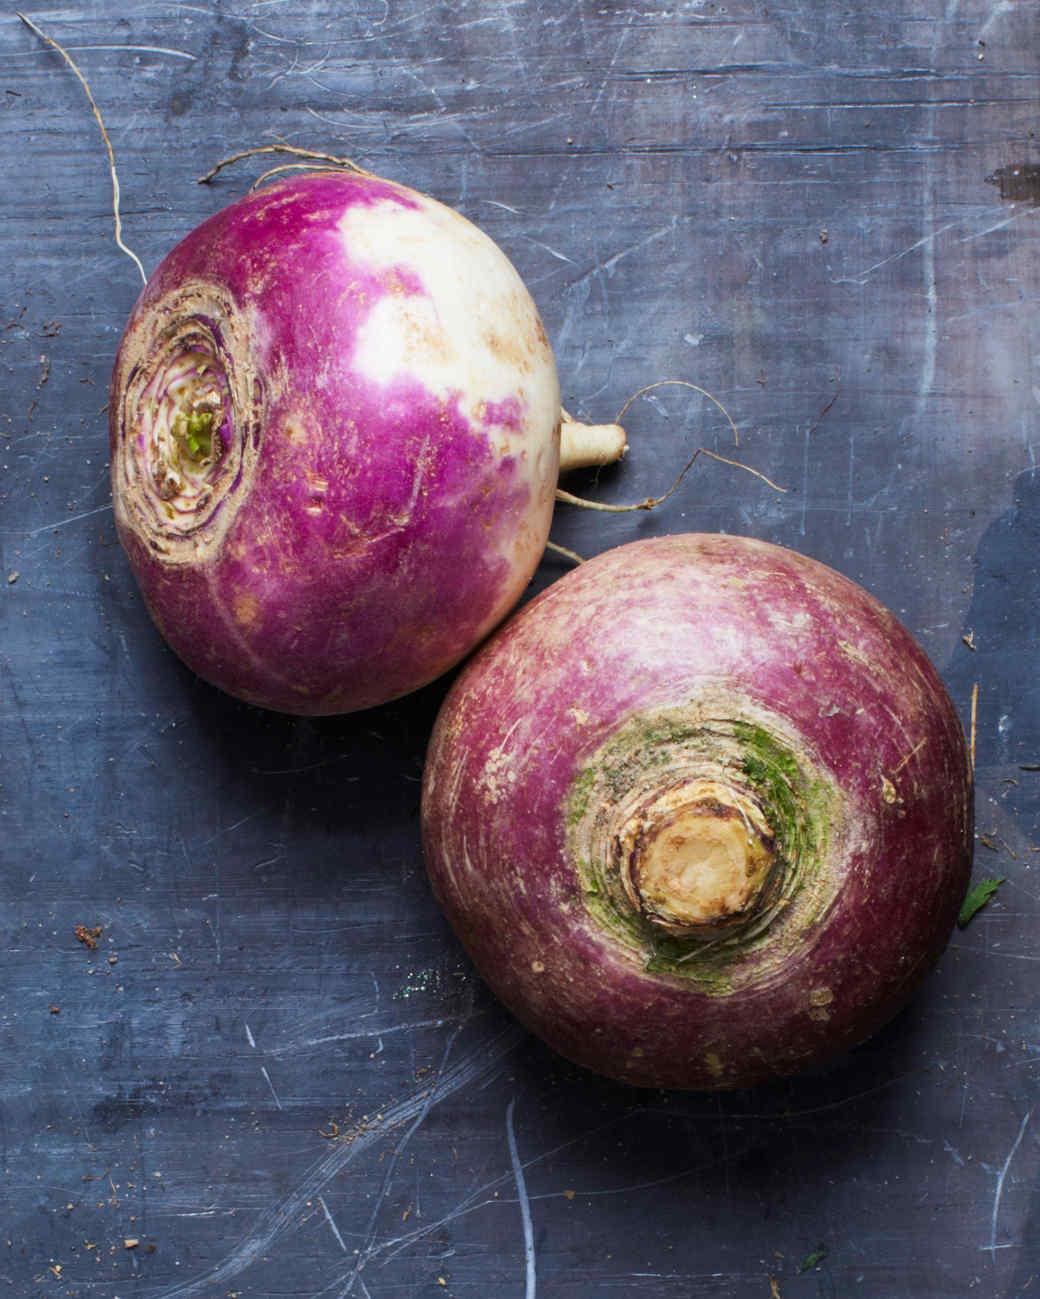 turnip-roots-tubers-211-d110486.jpg